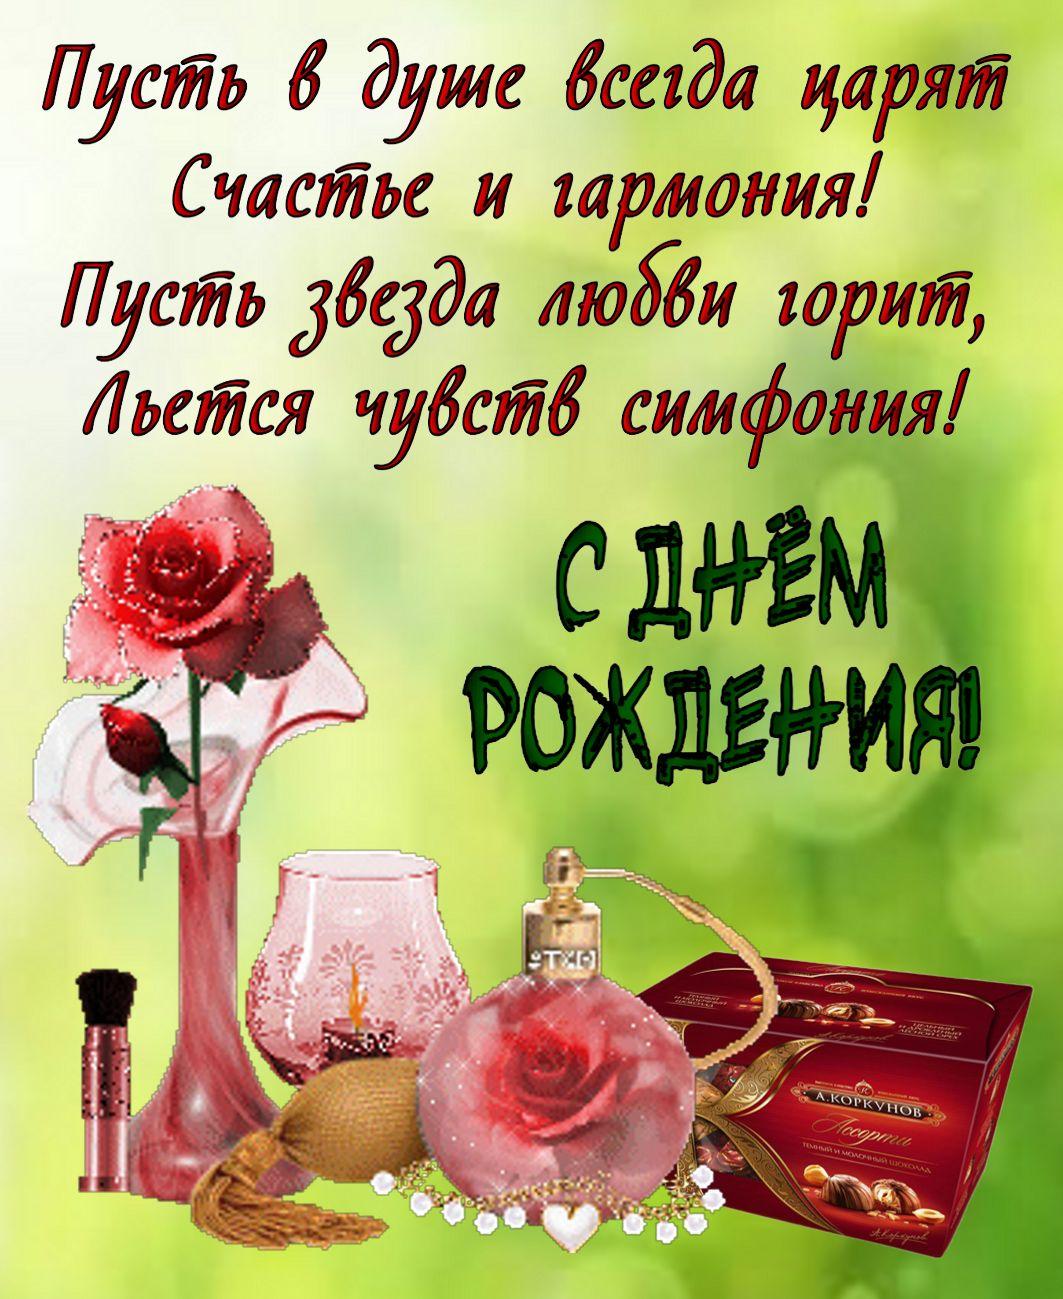 открытка - роза и конфеты на красивом фоне